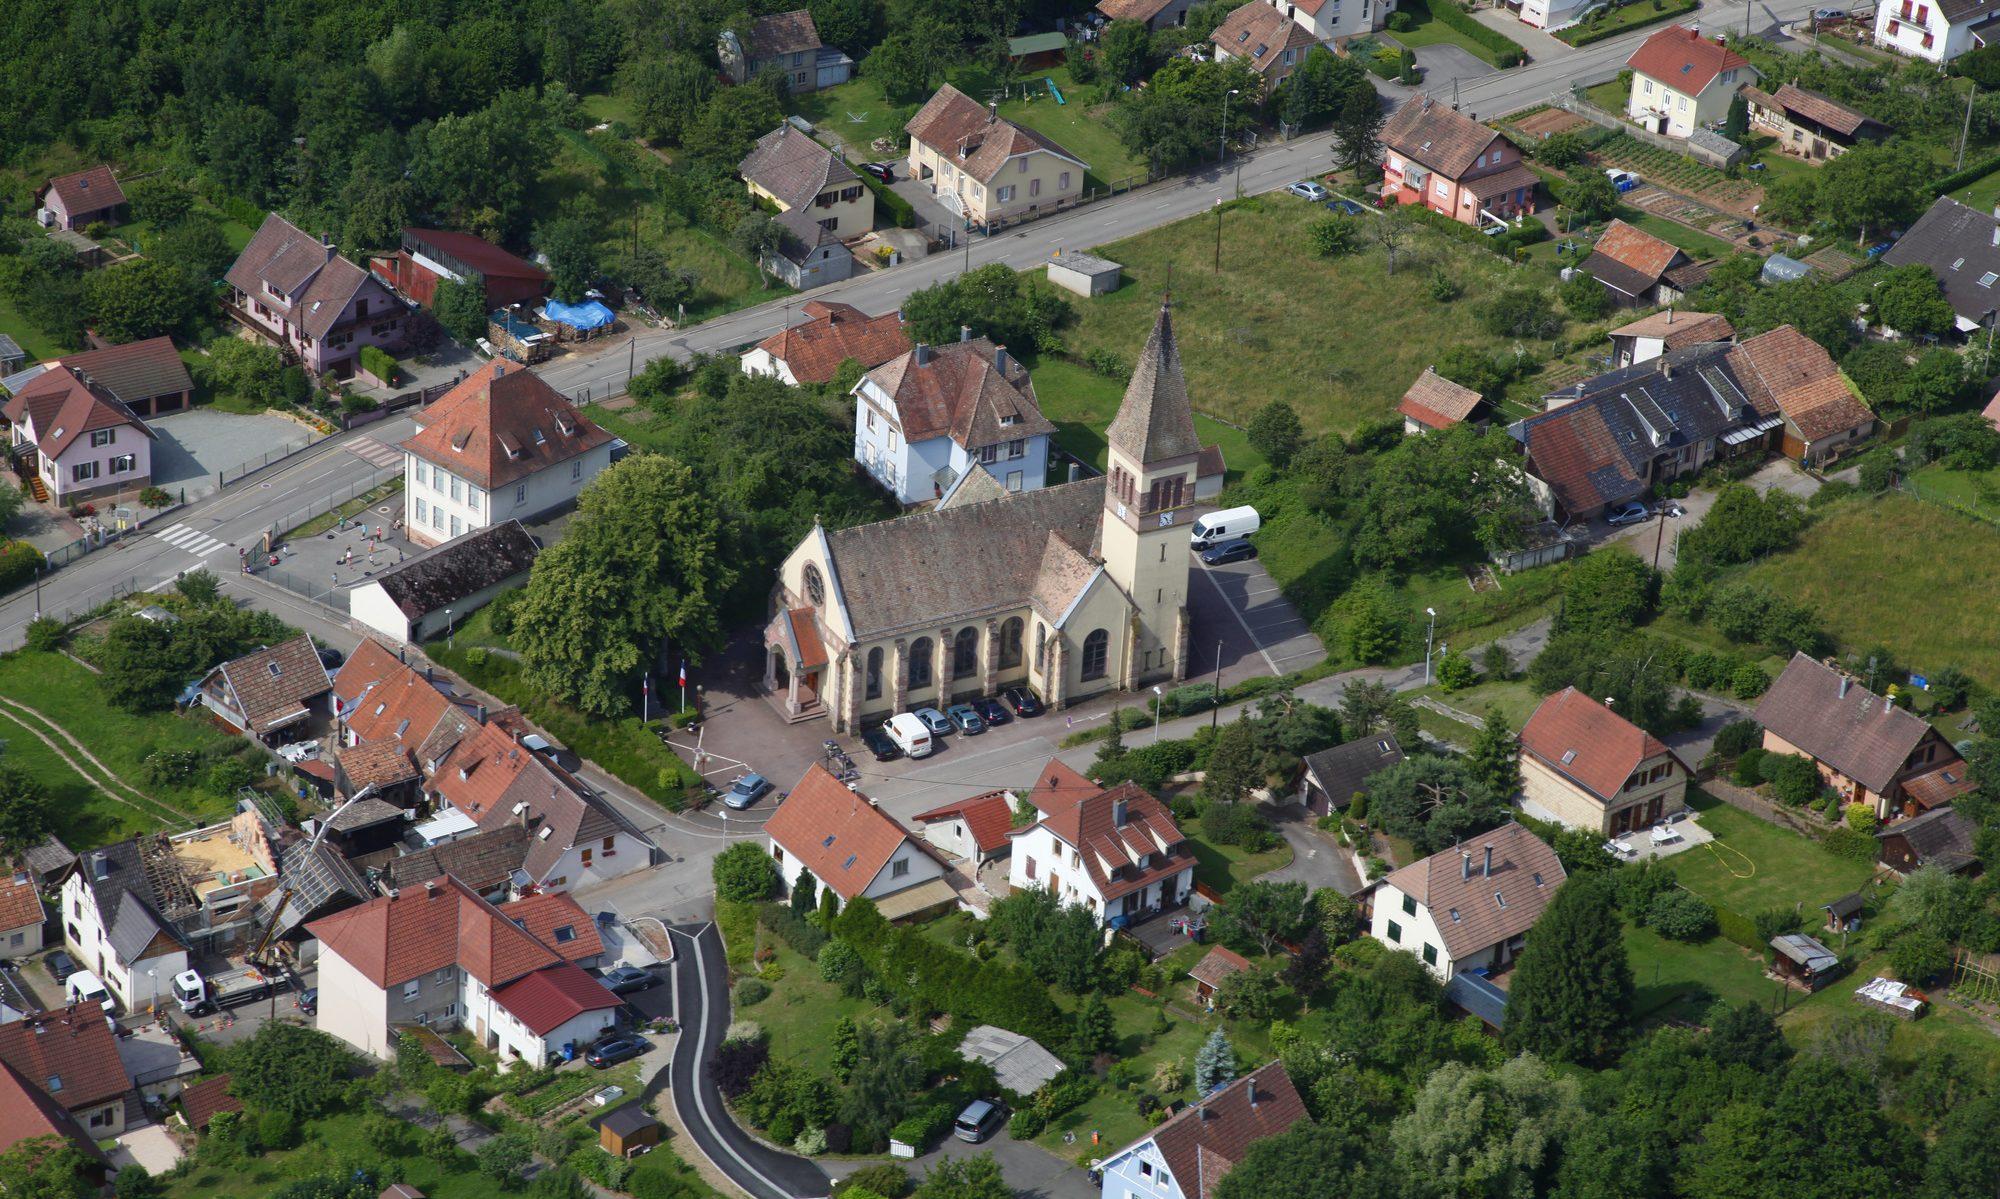 Leimbach